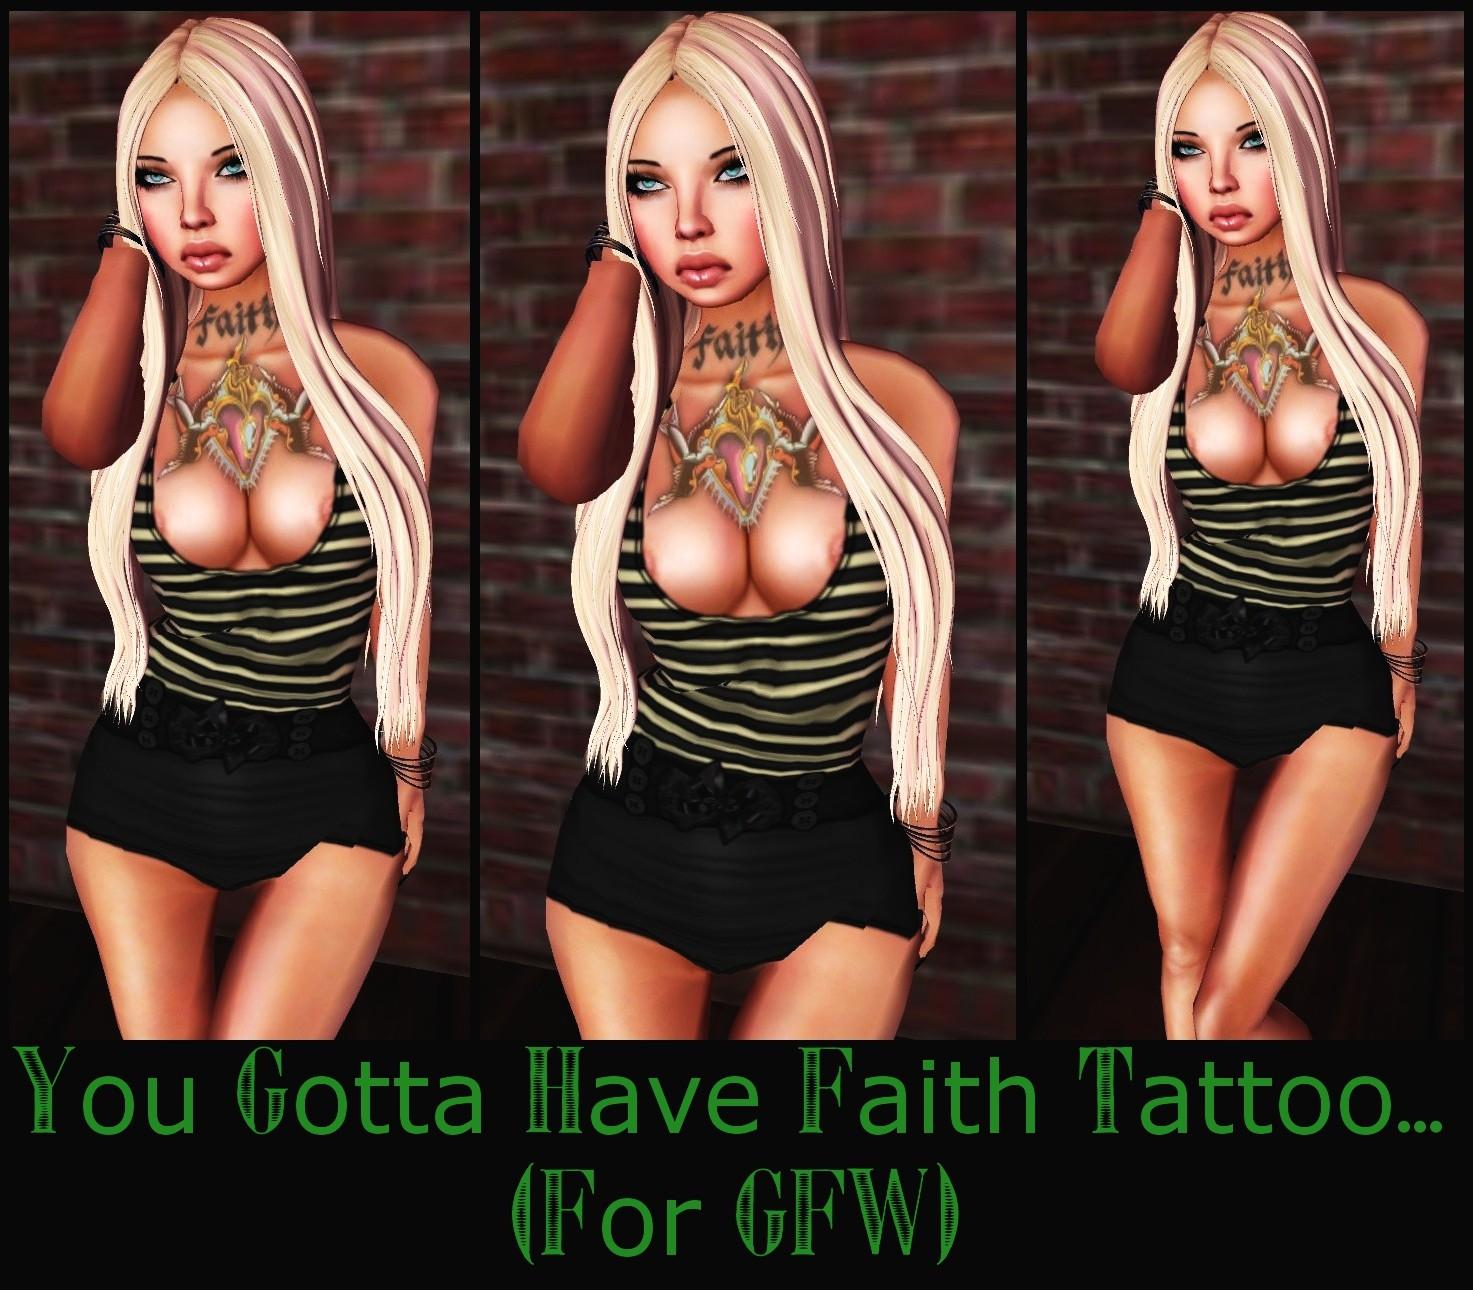 http://3.bp.blogspot.com/-bmUx8YzKSBM/UATkLozEDaI/AAAAAAAAC0o/VyBv_a8aGIc/s1600/Tenjin%2BYou%2BGotta%2BHave%2BFaith%2BTattoo.jpg